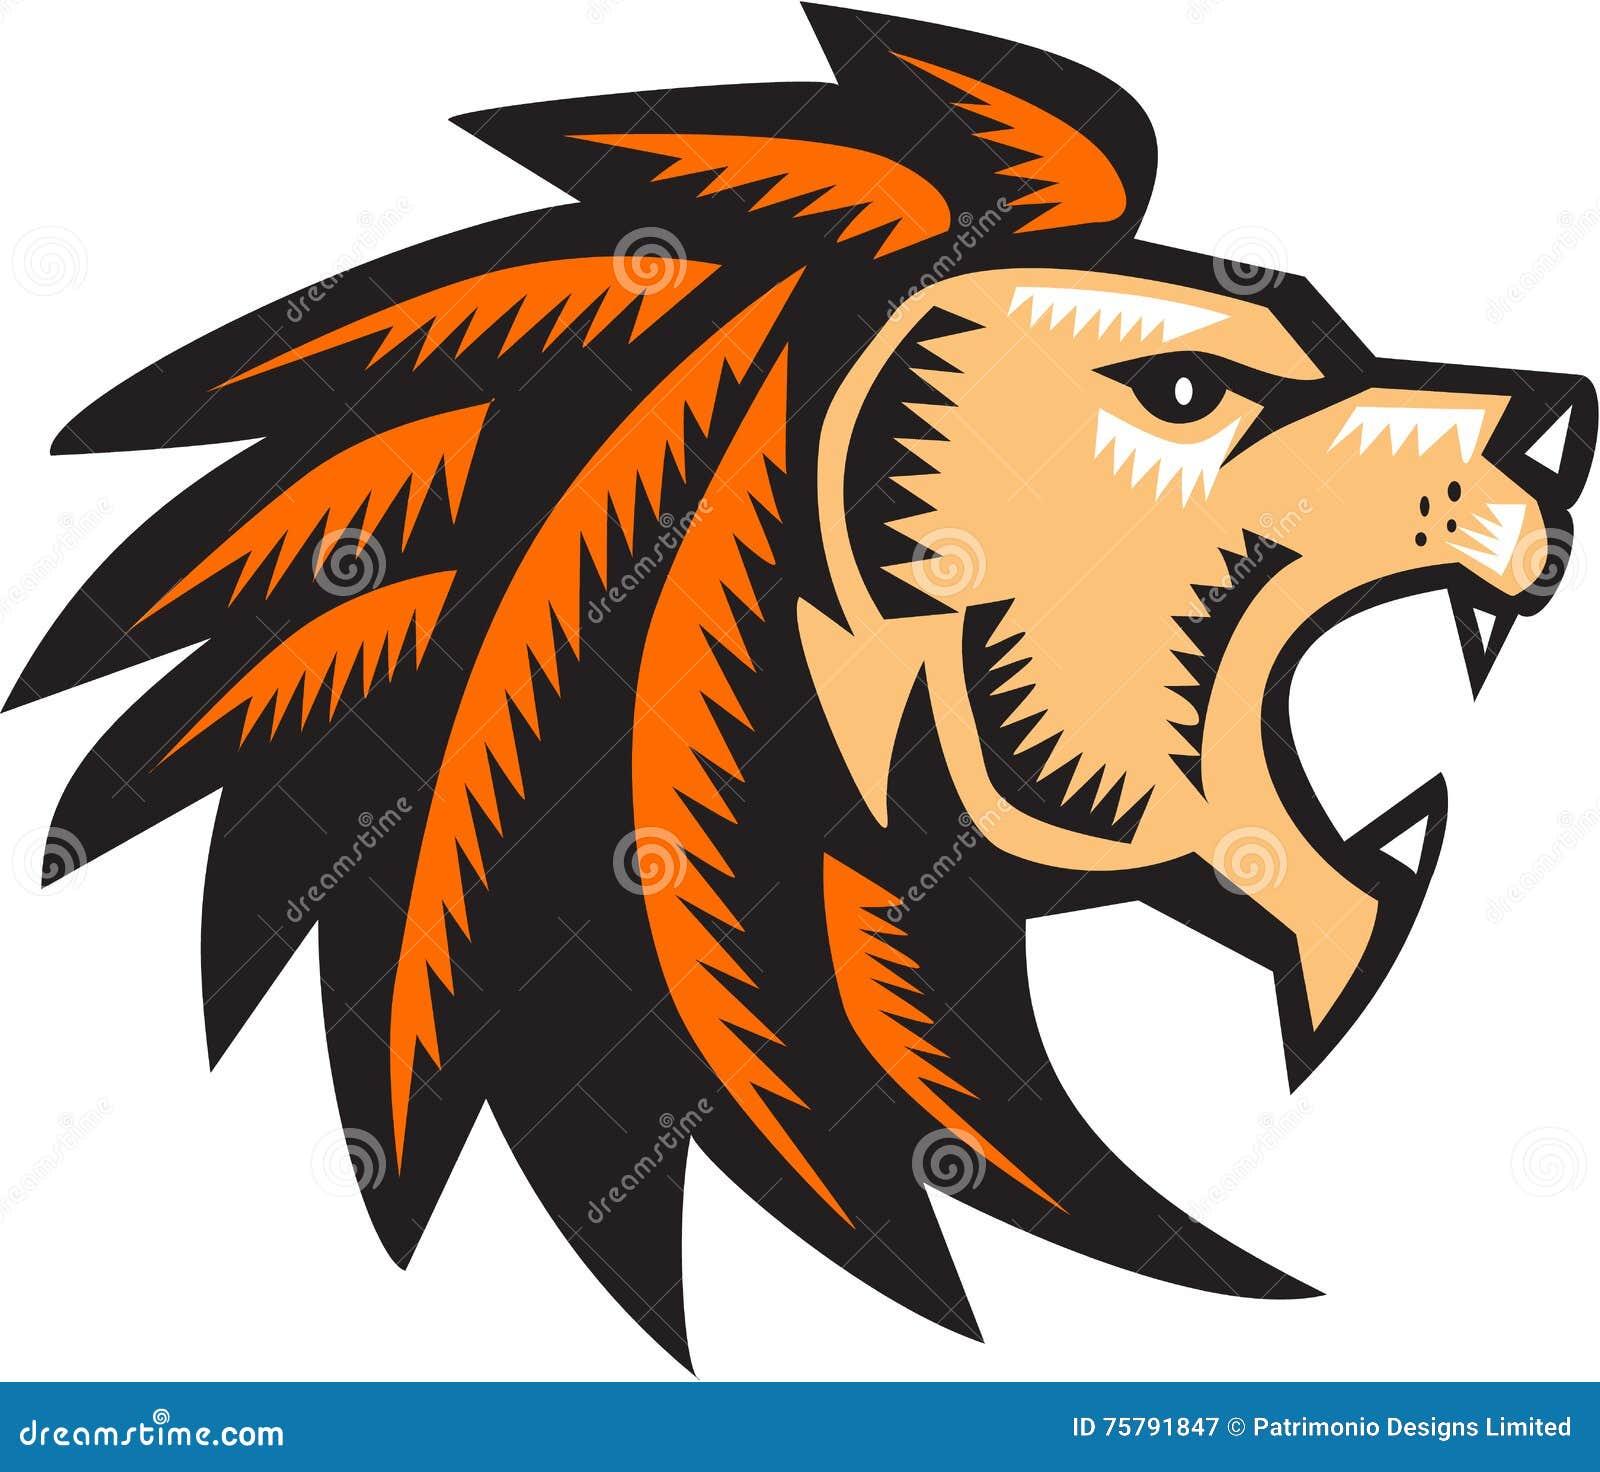 Big Cat Growl: Angry Lion Big Cat Growling Head Woodcut Stock Vector